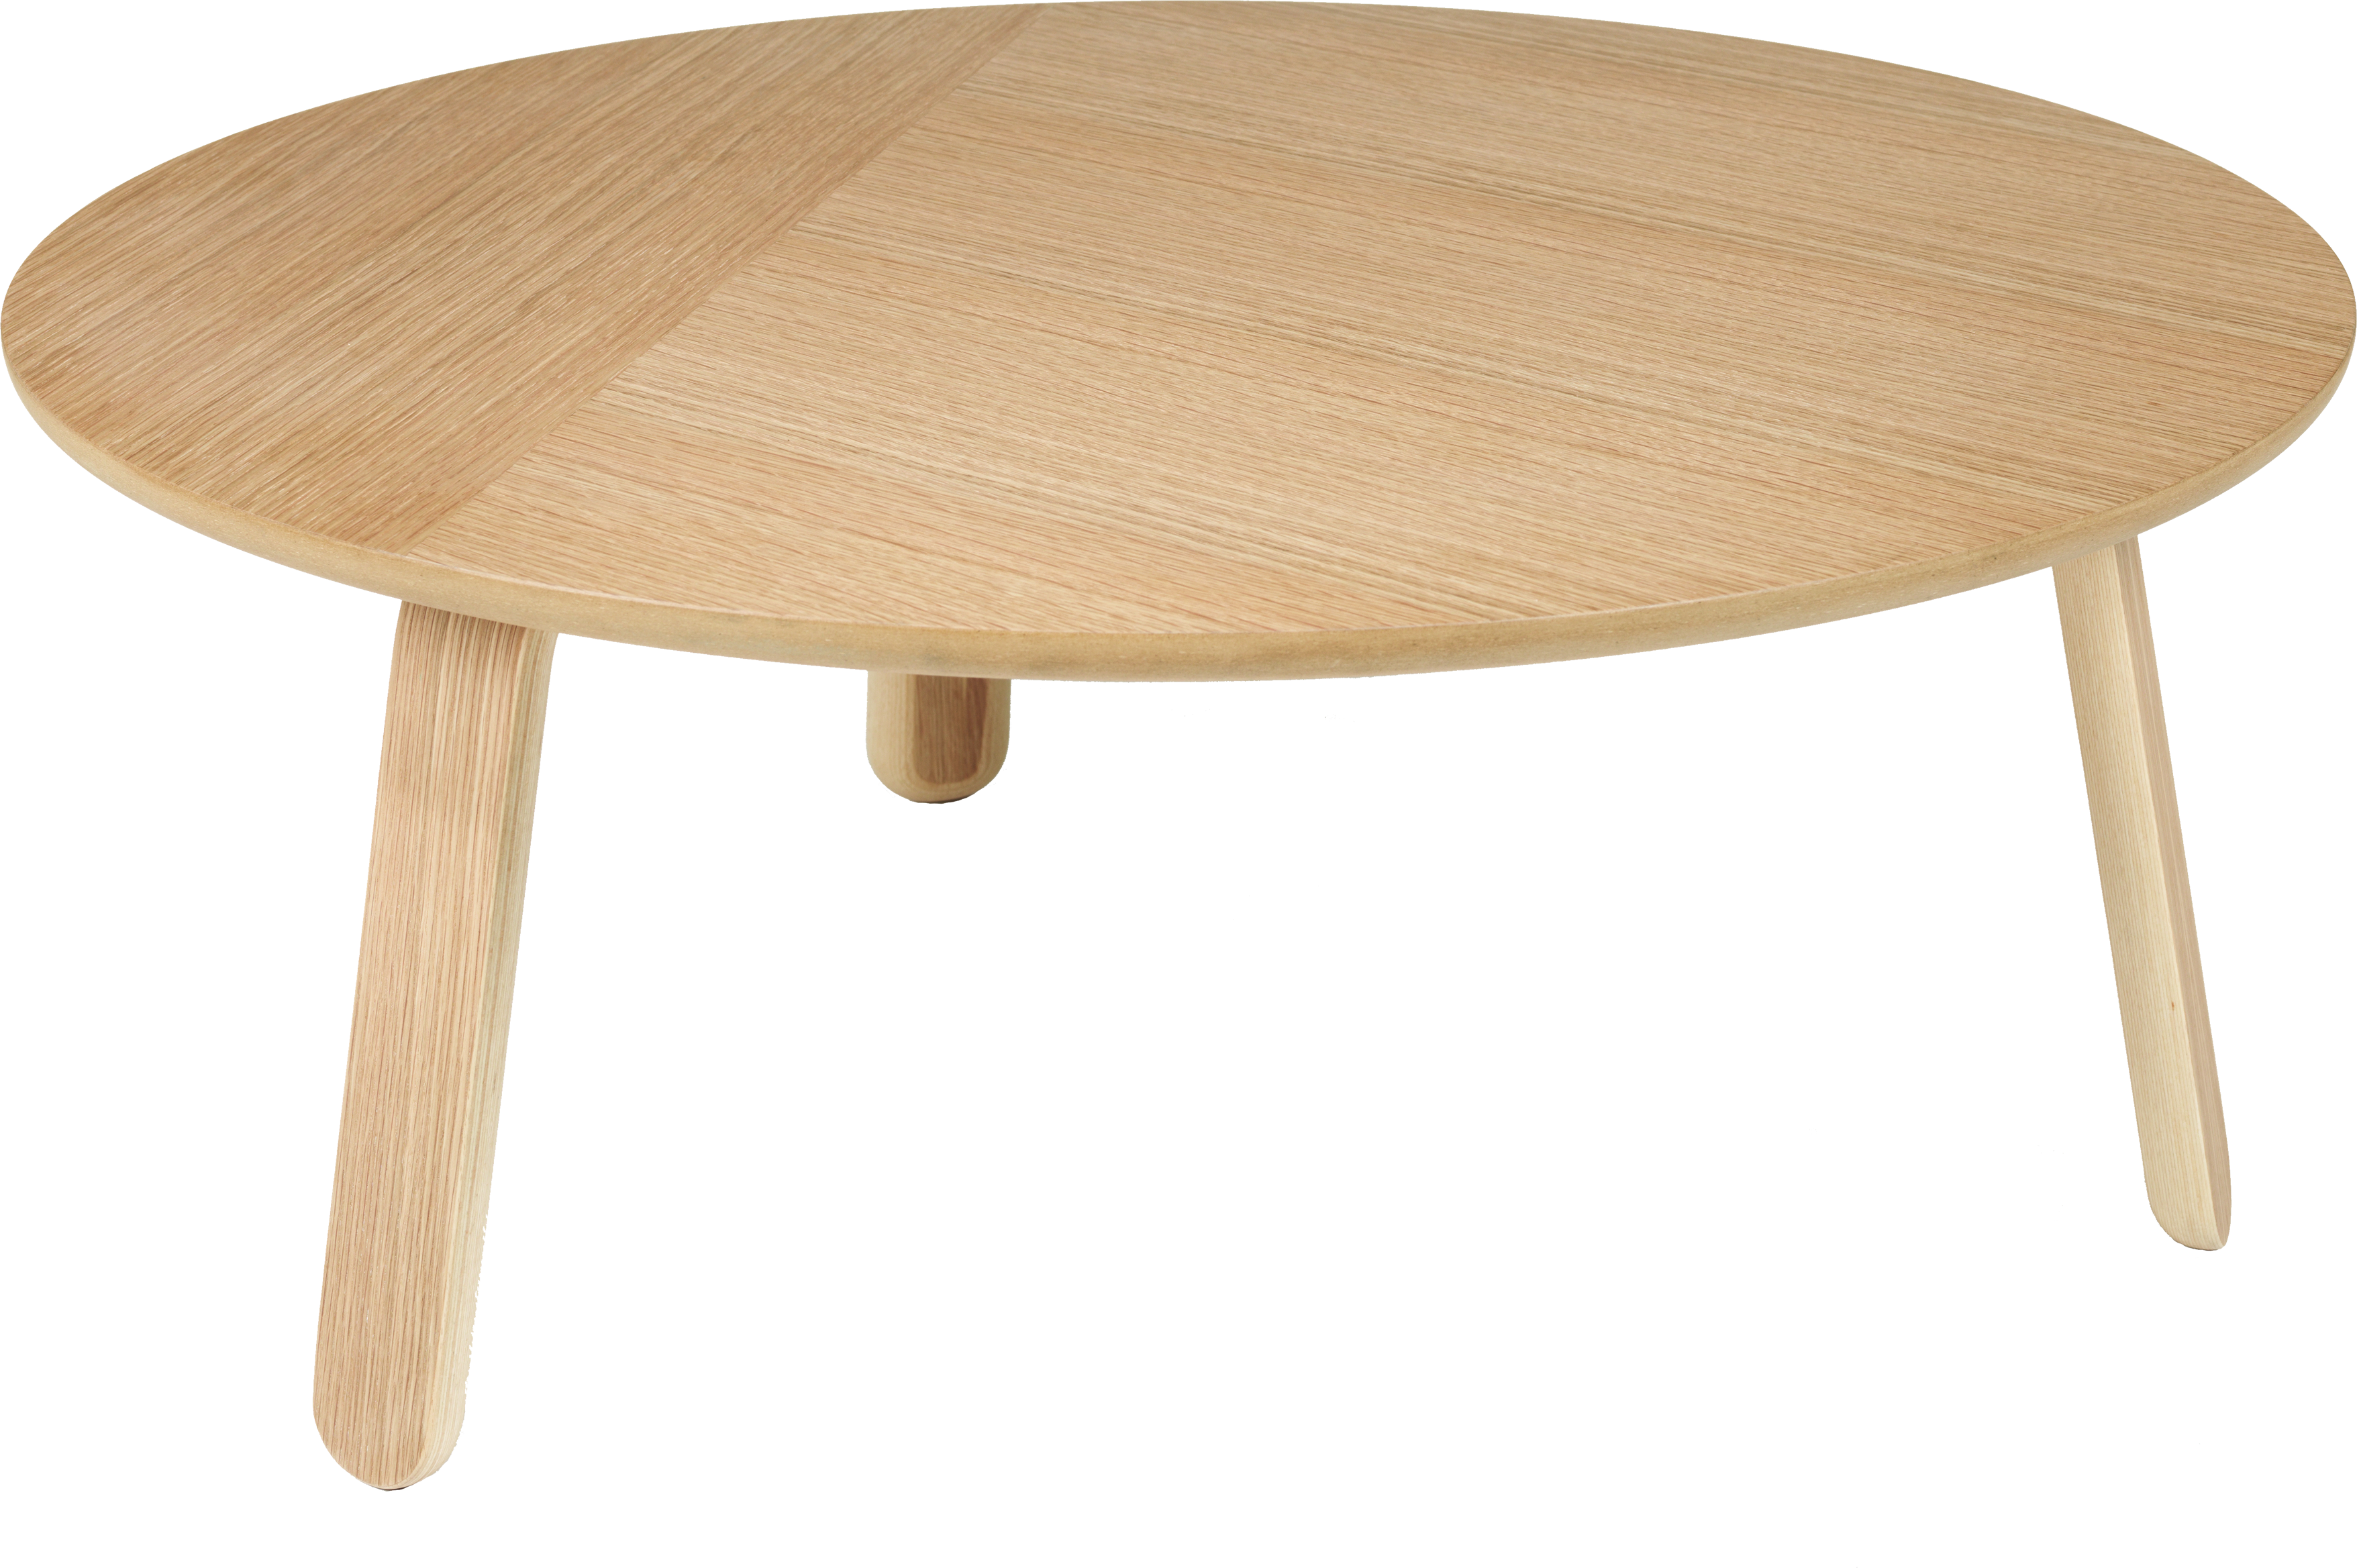 Wooden Table Png Image Metallic Painted Furniture Modern Vintage Furniture Table